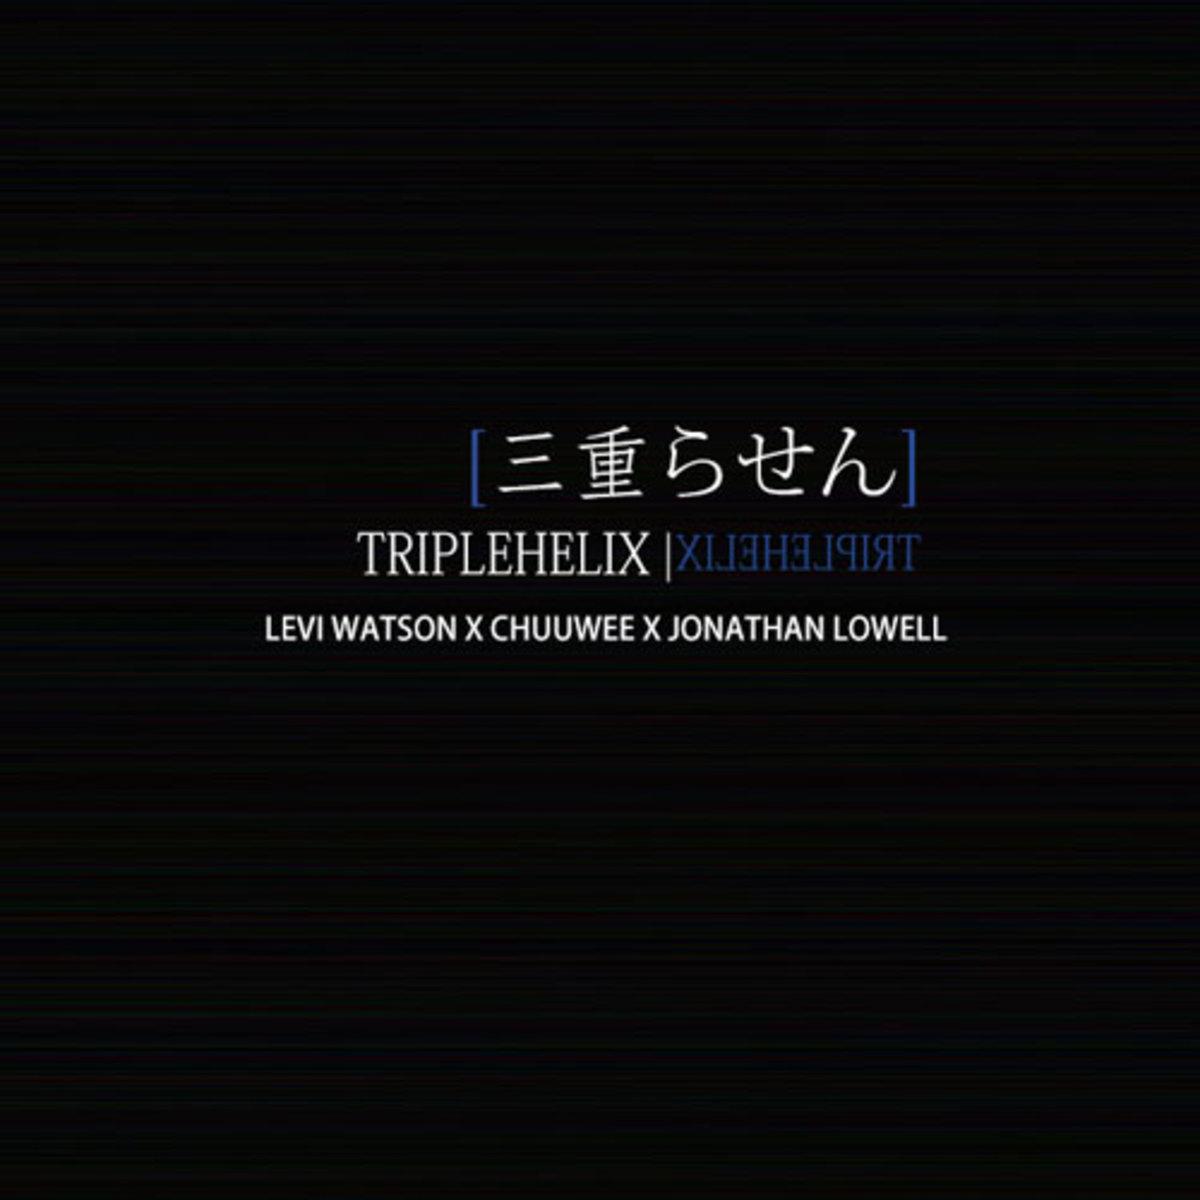 leviwatson-triplehelix.jpg